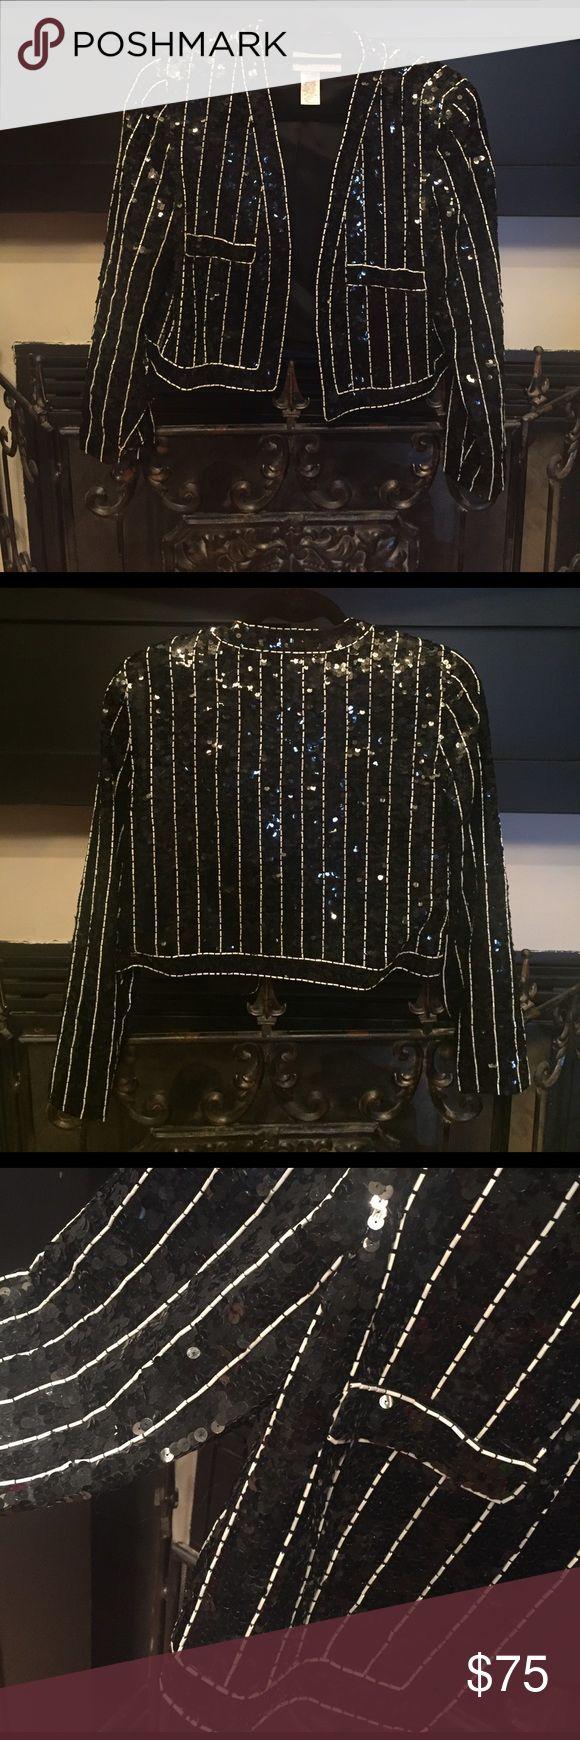 Sequin blazer Short sequin blazer with white beaded trim Vintage Jackets & Coats Blazers